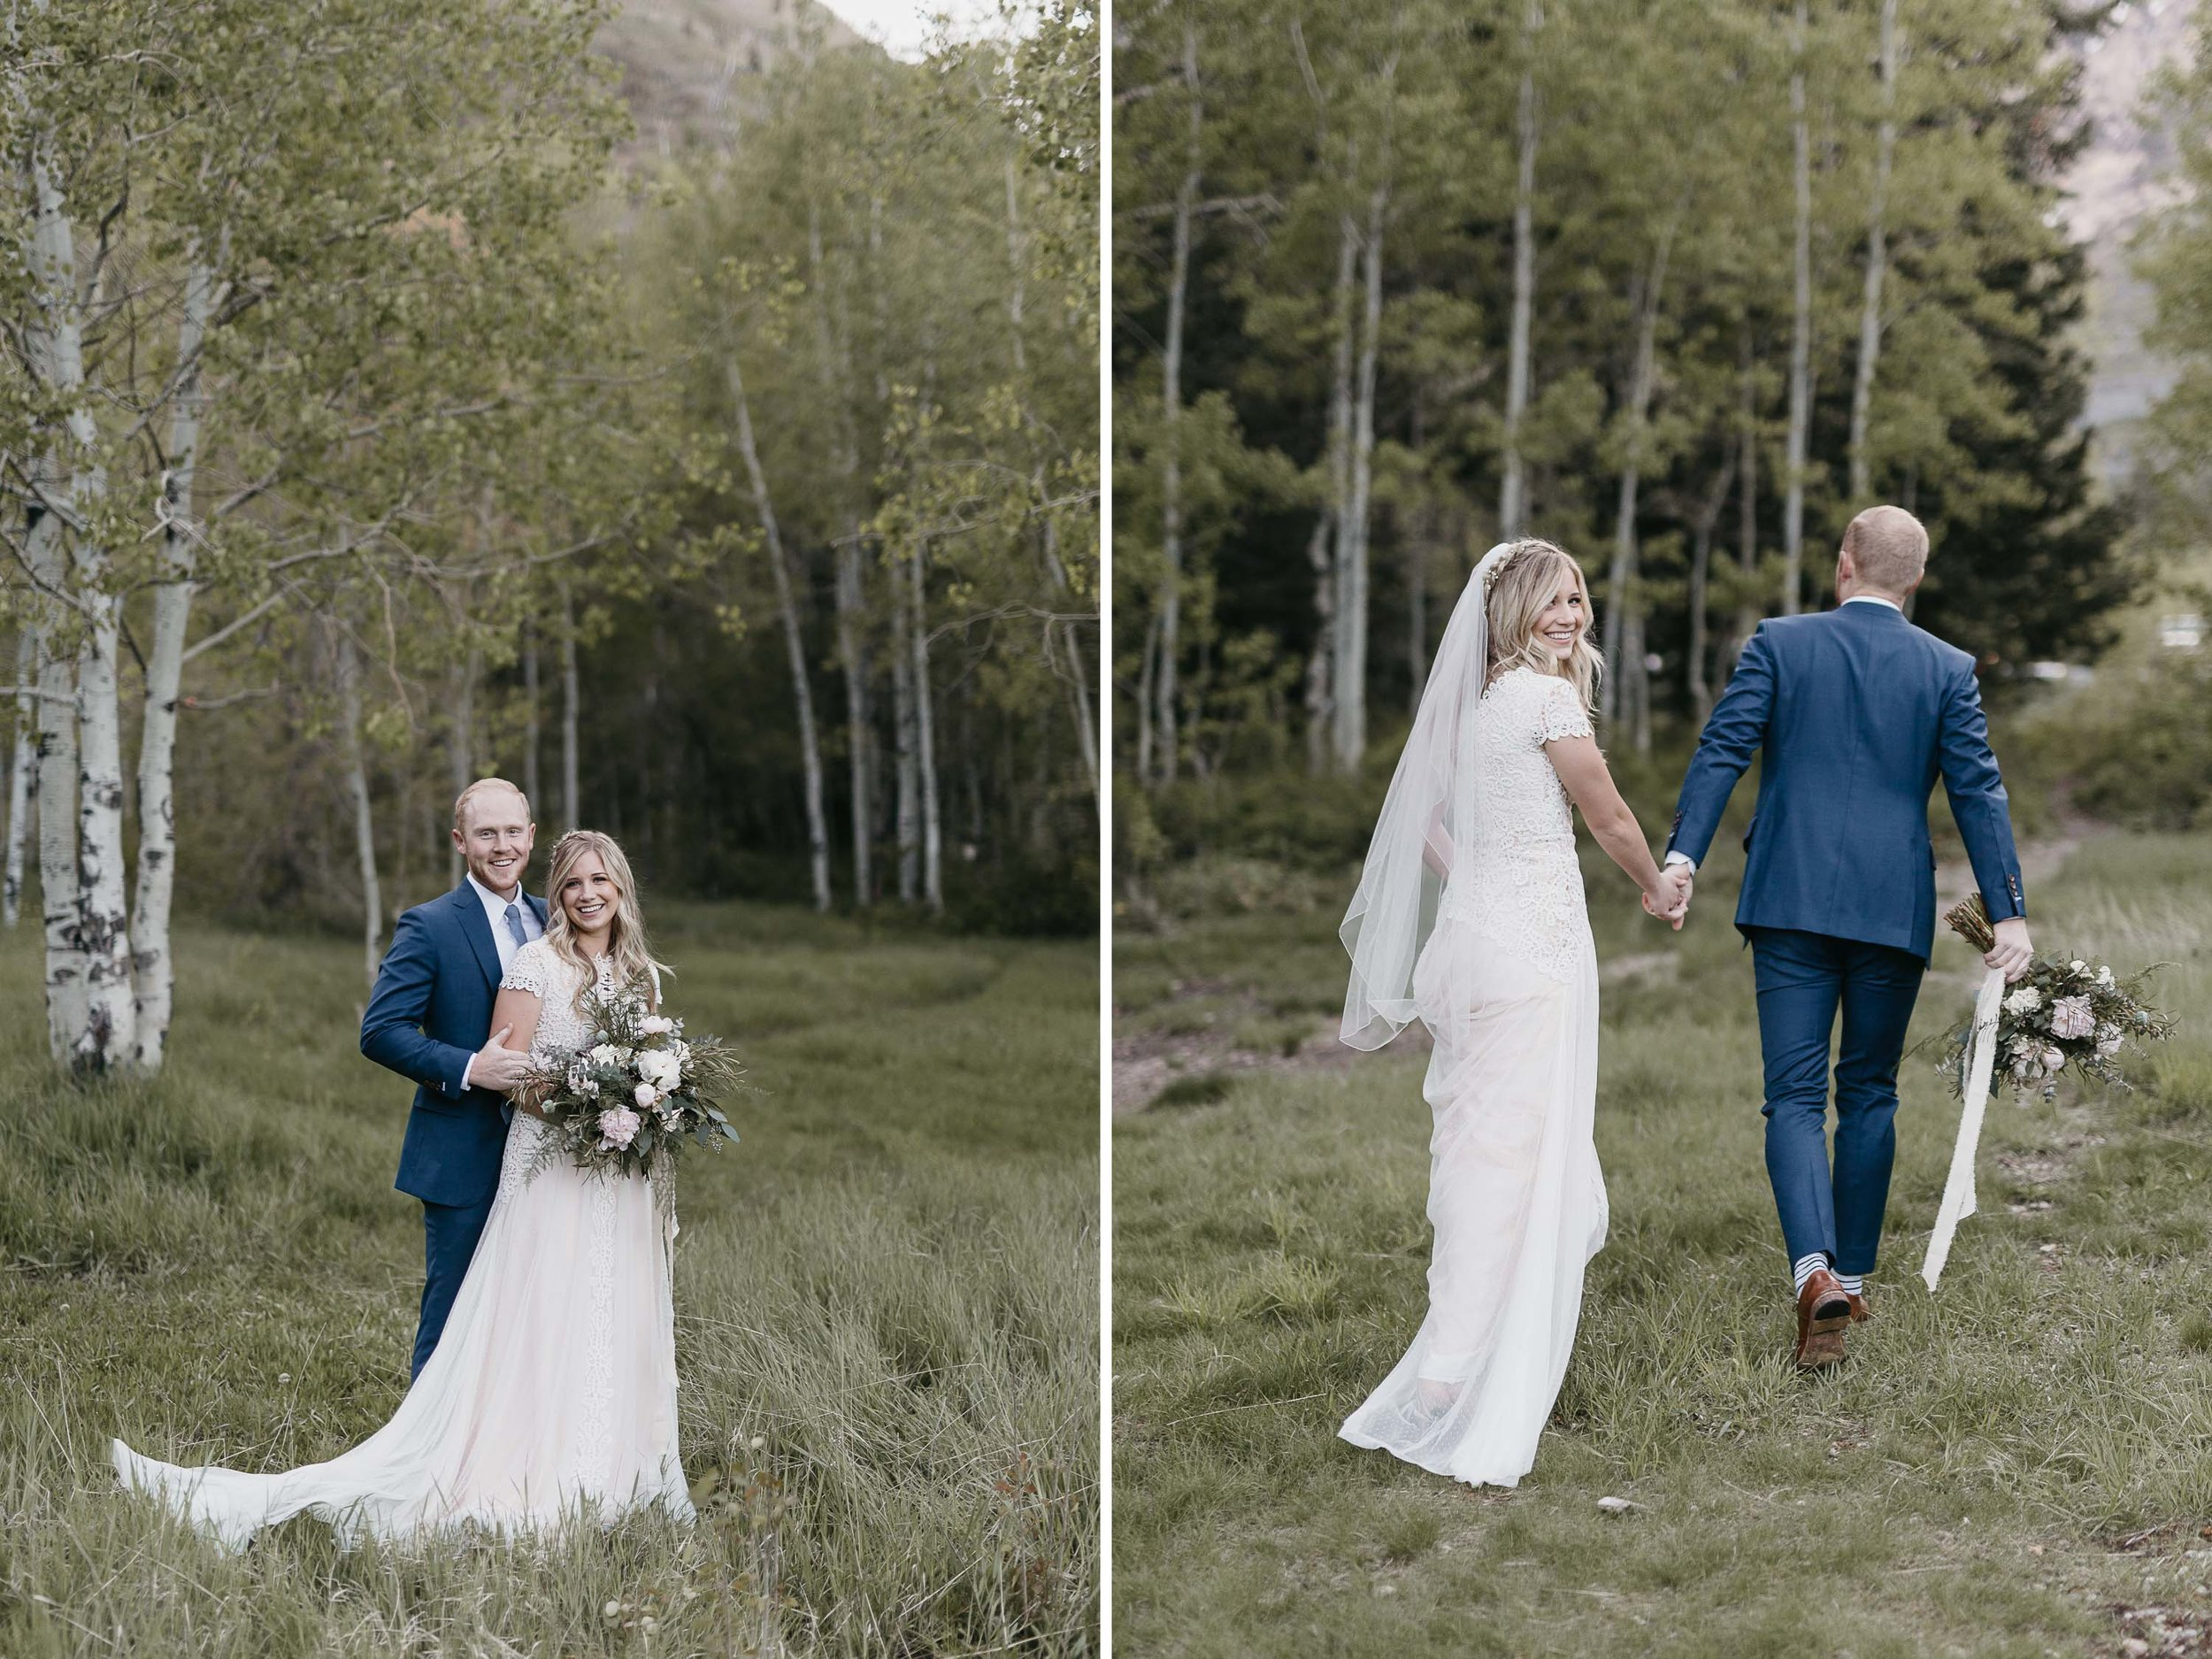 Utah-Wedding-Photographer-7.jpg